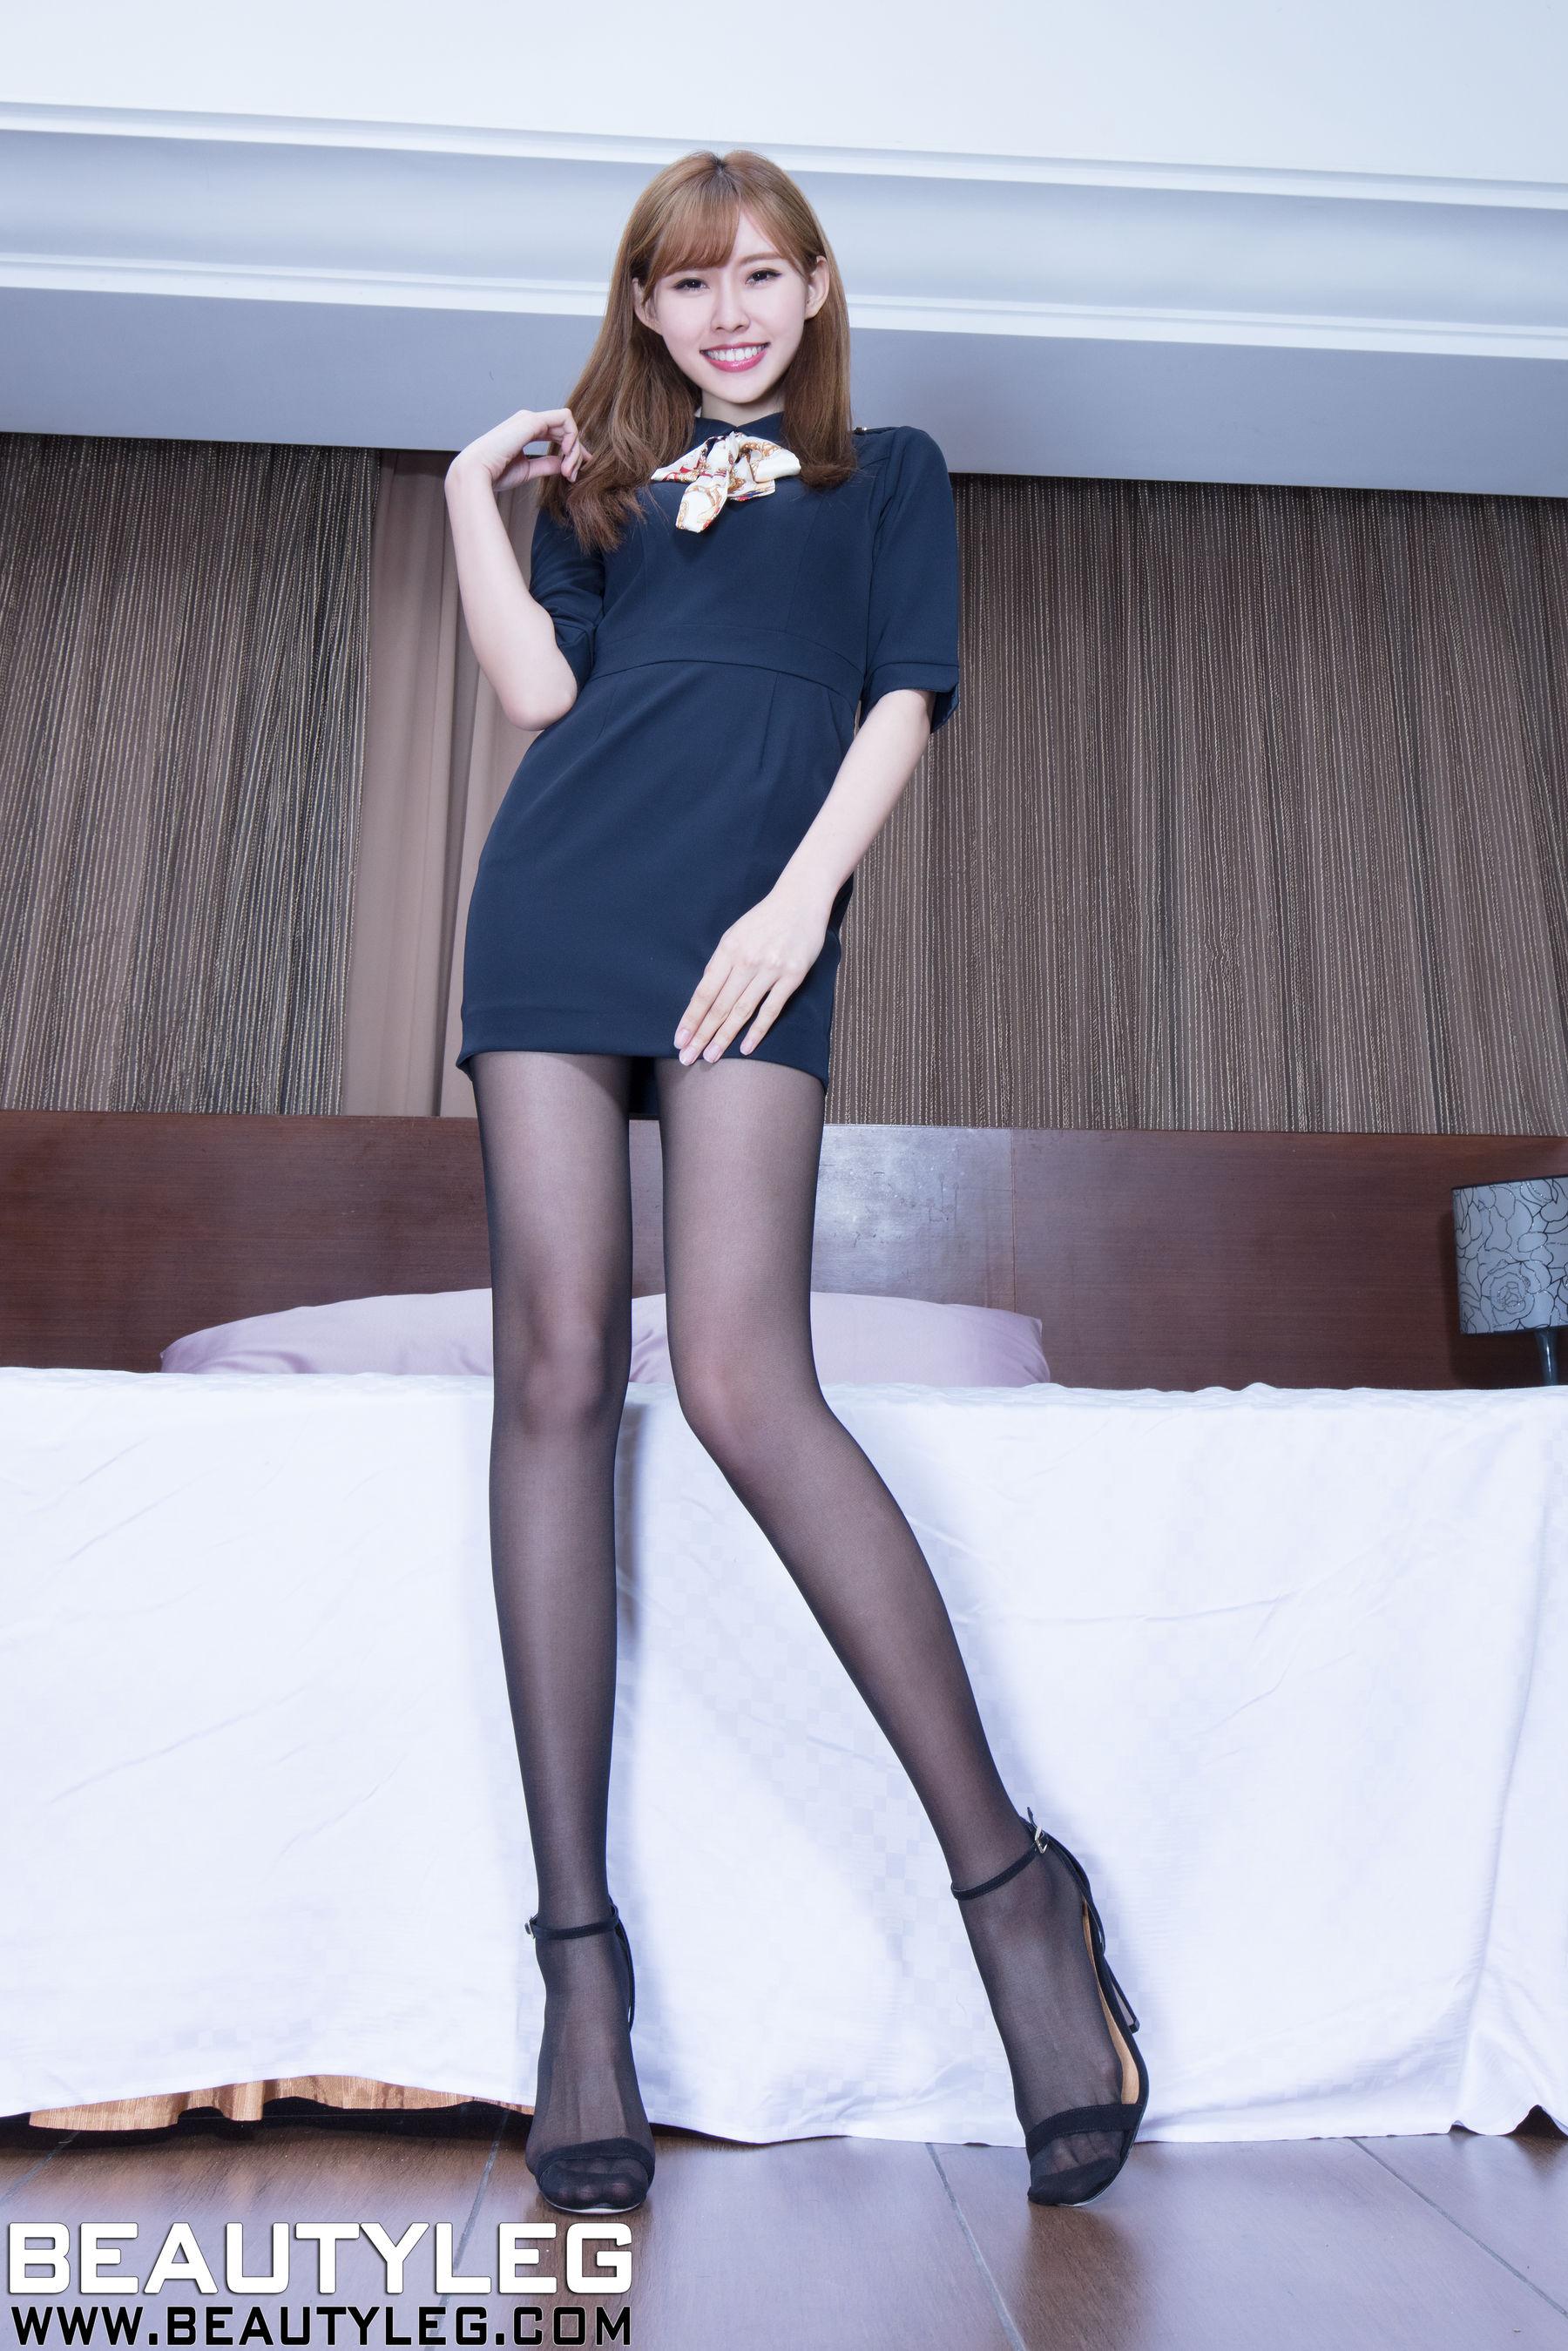 VOL.841 [Beautyleg]丝袜美腿长腿美女丝足高跟:郭珉妏(腿模Queenie)高品质写真套图(43P)